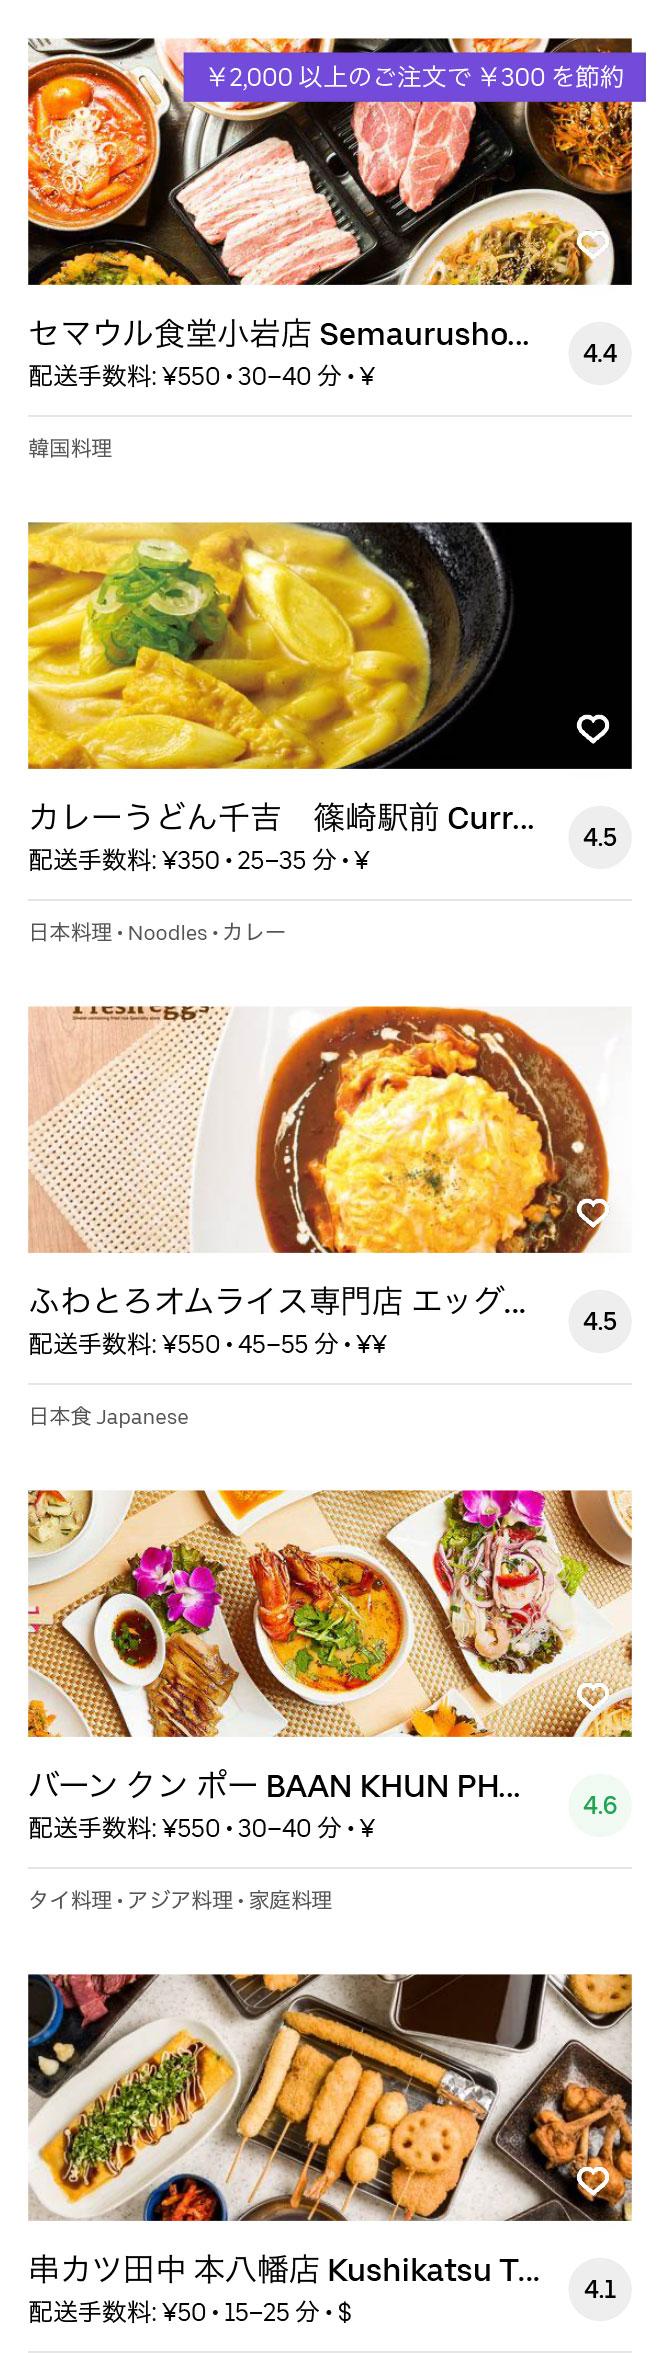 Ichikawa motoyawata menu 2004 11